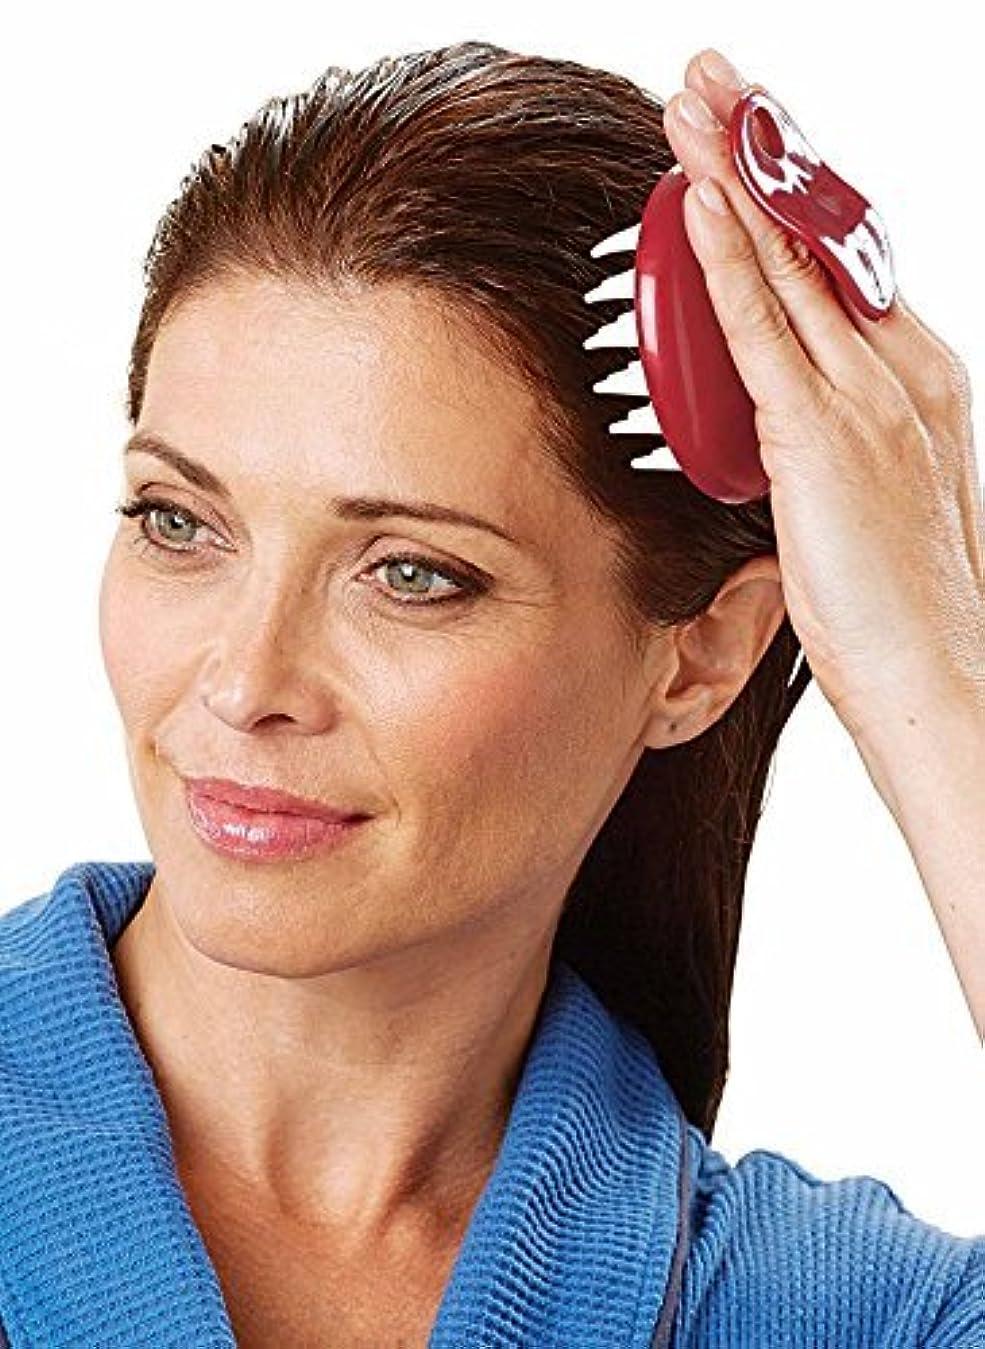 Set of 2 Shampoo and Scalp Hair Washing Comb Massager Brush [並行輸入品]